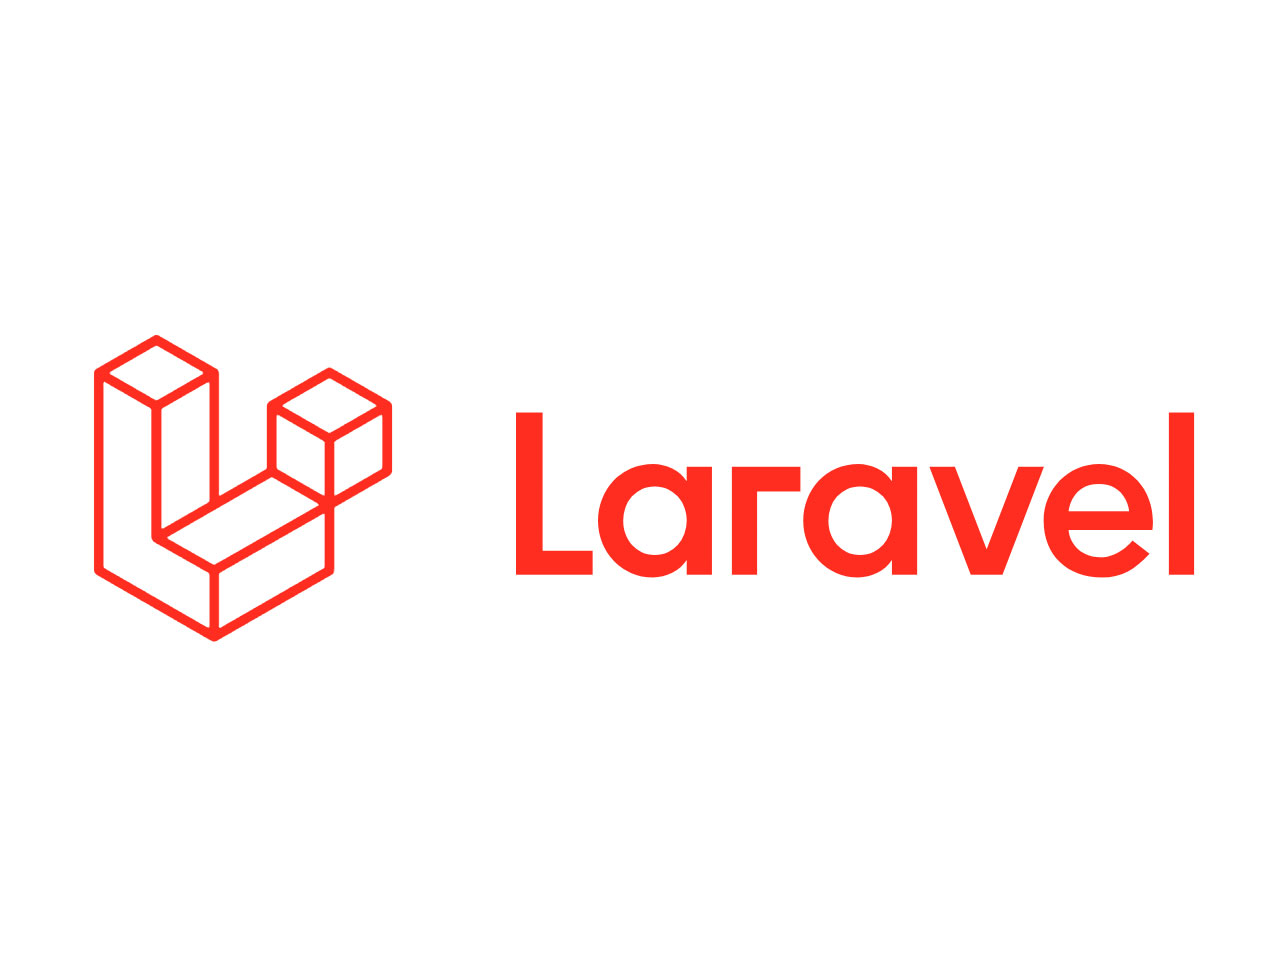 Laravel 6 logo